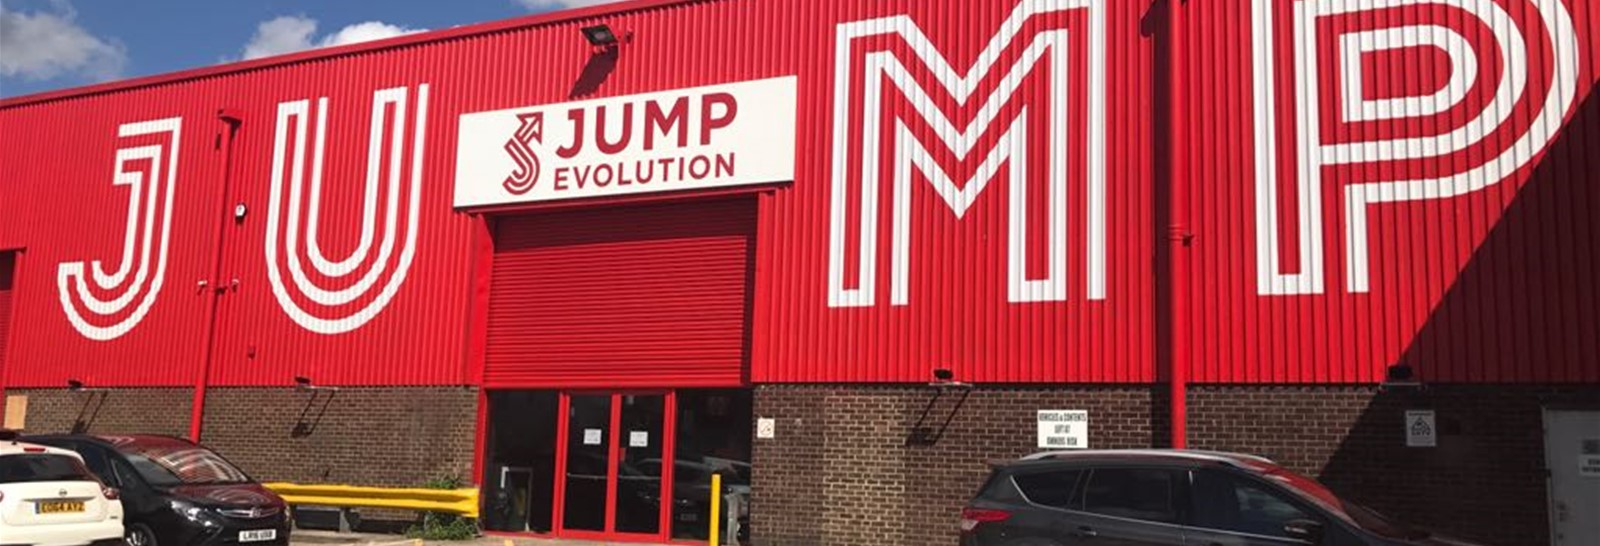 Jump Evolution wins best project award